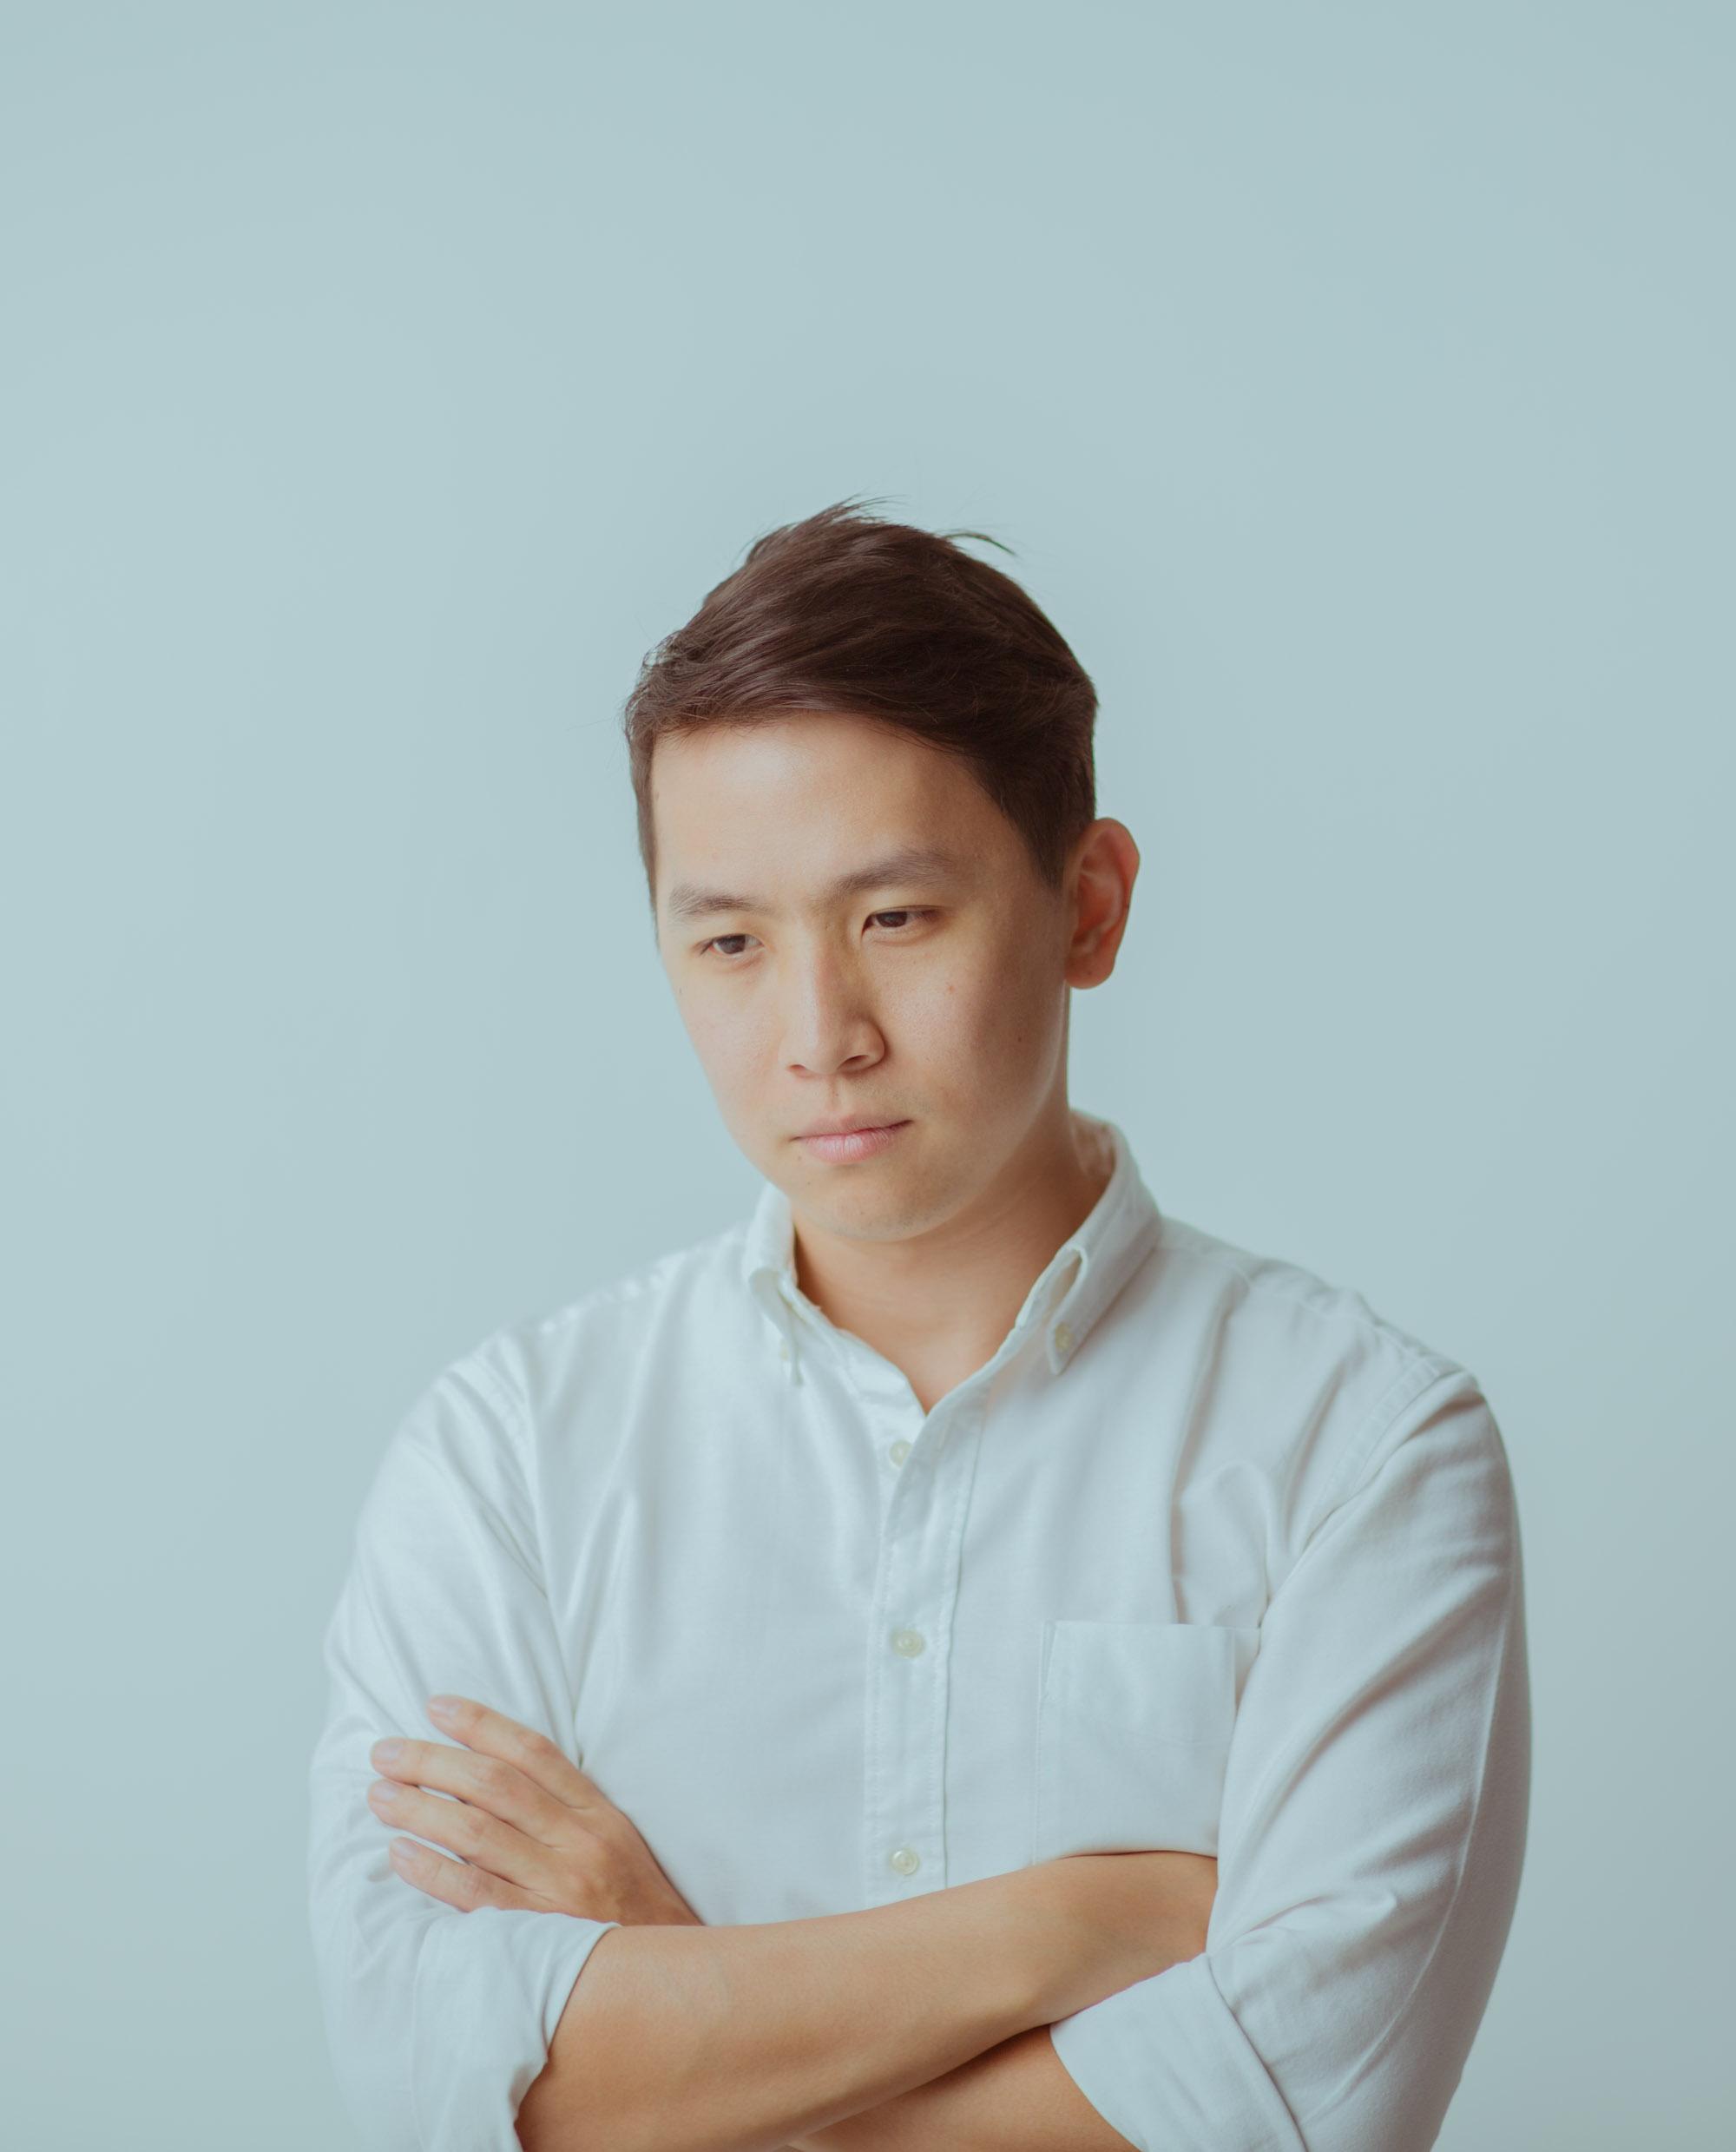 TAY JIE MING